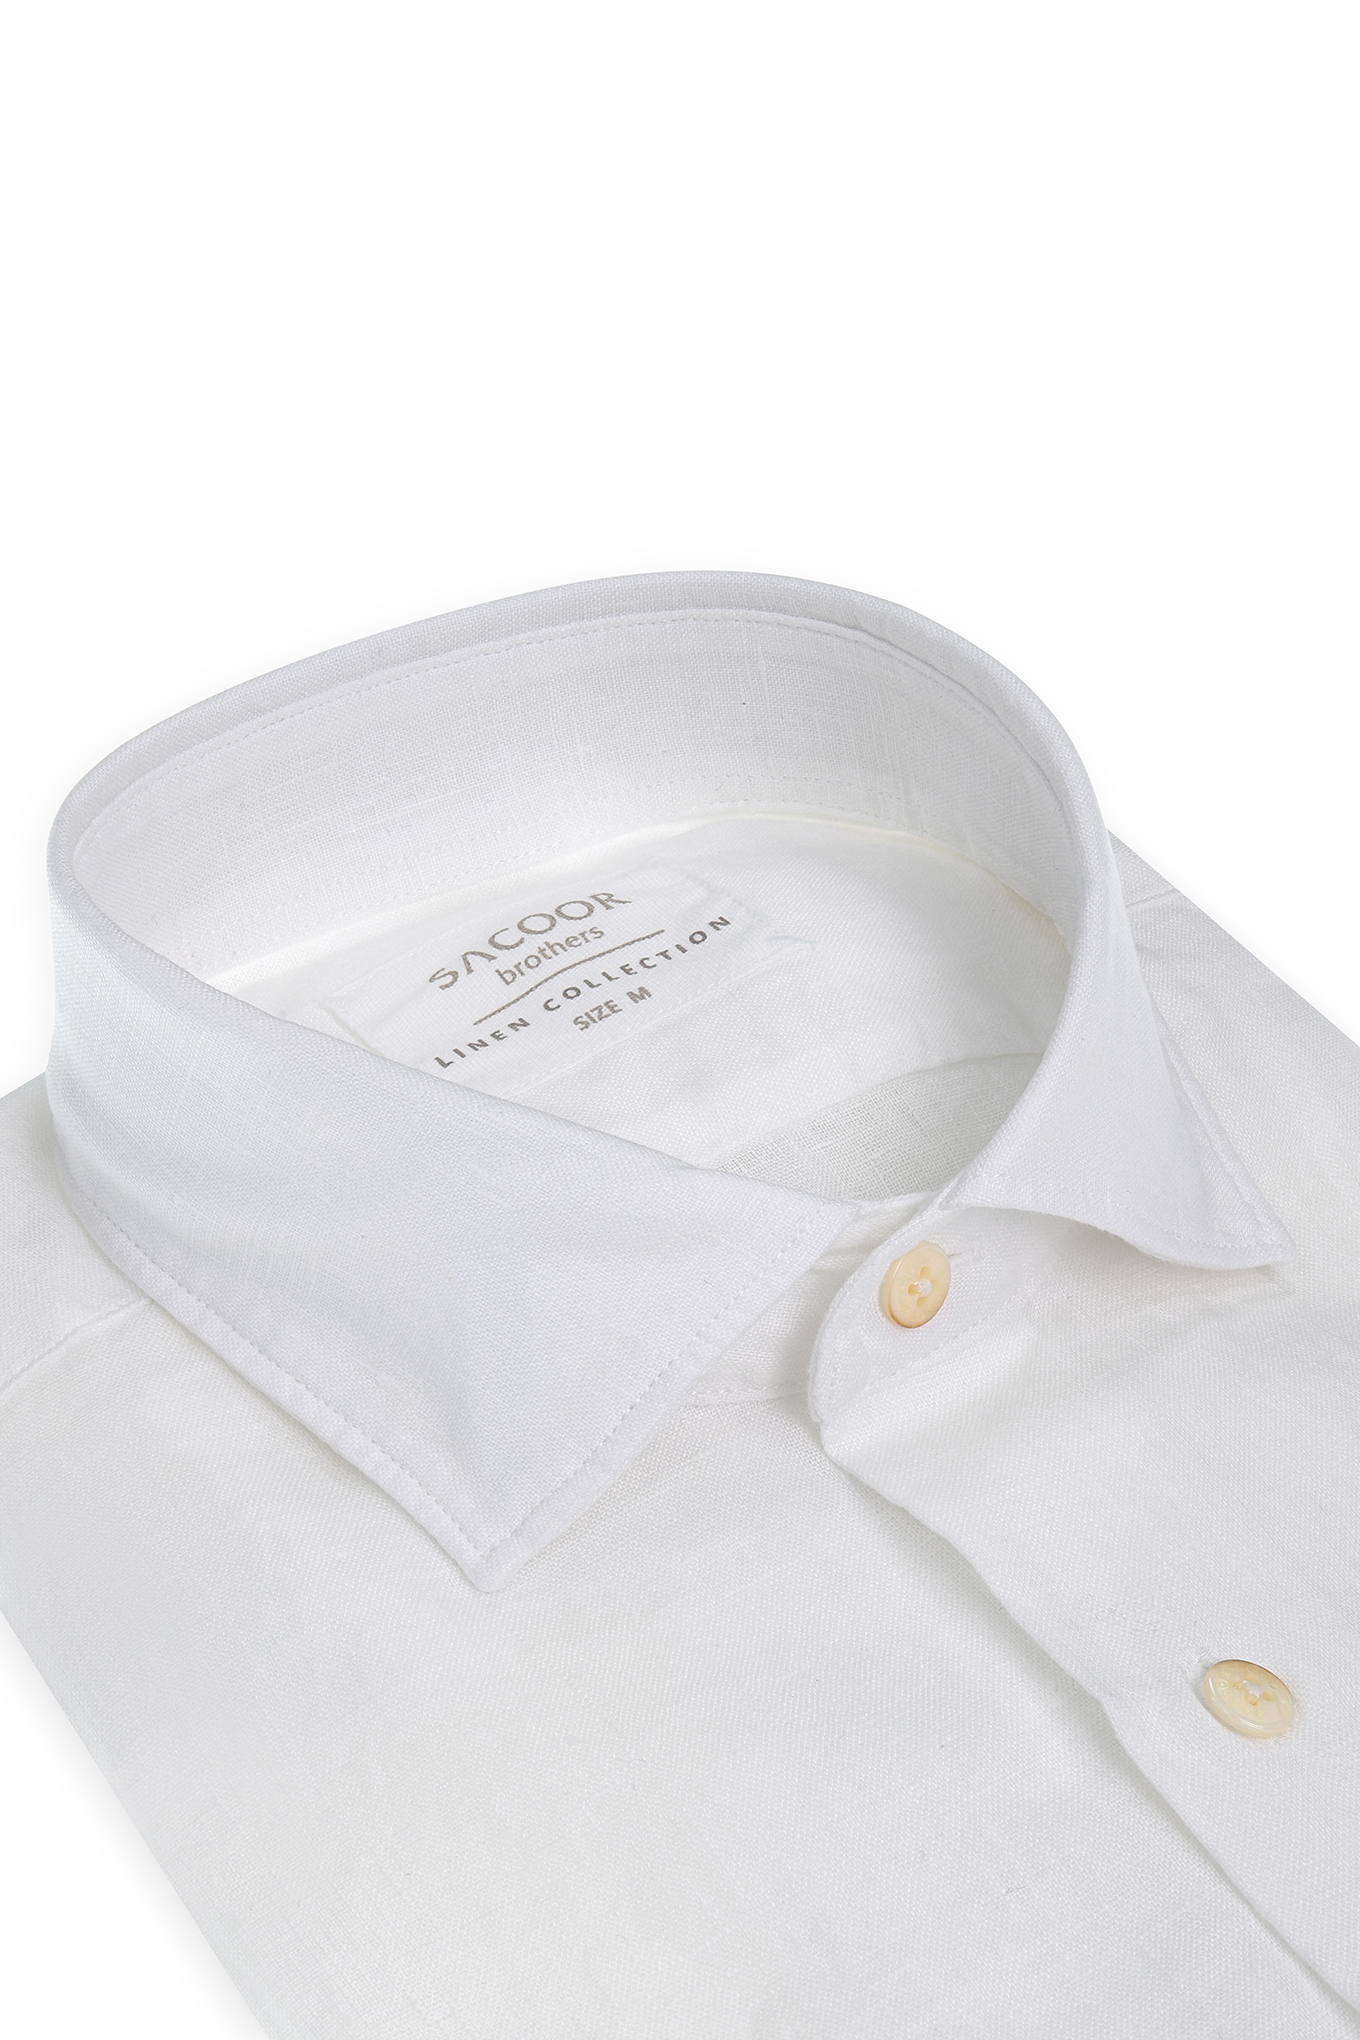 Shirt White Casual Man